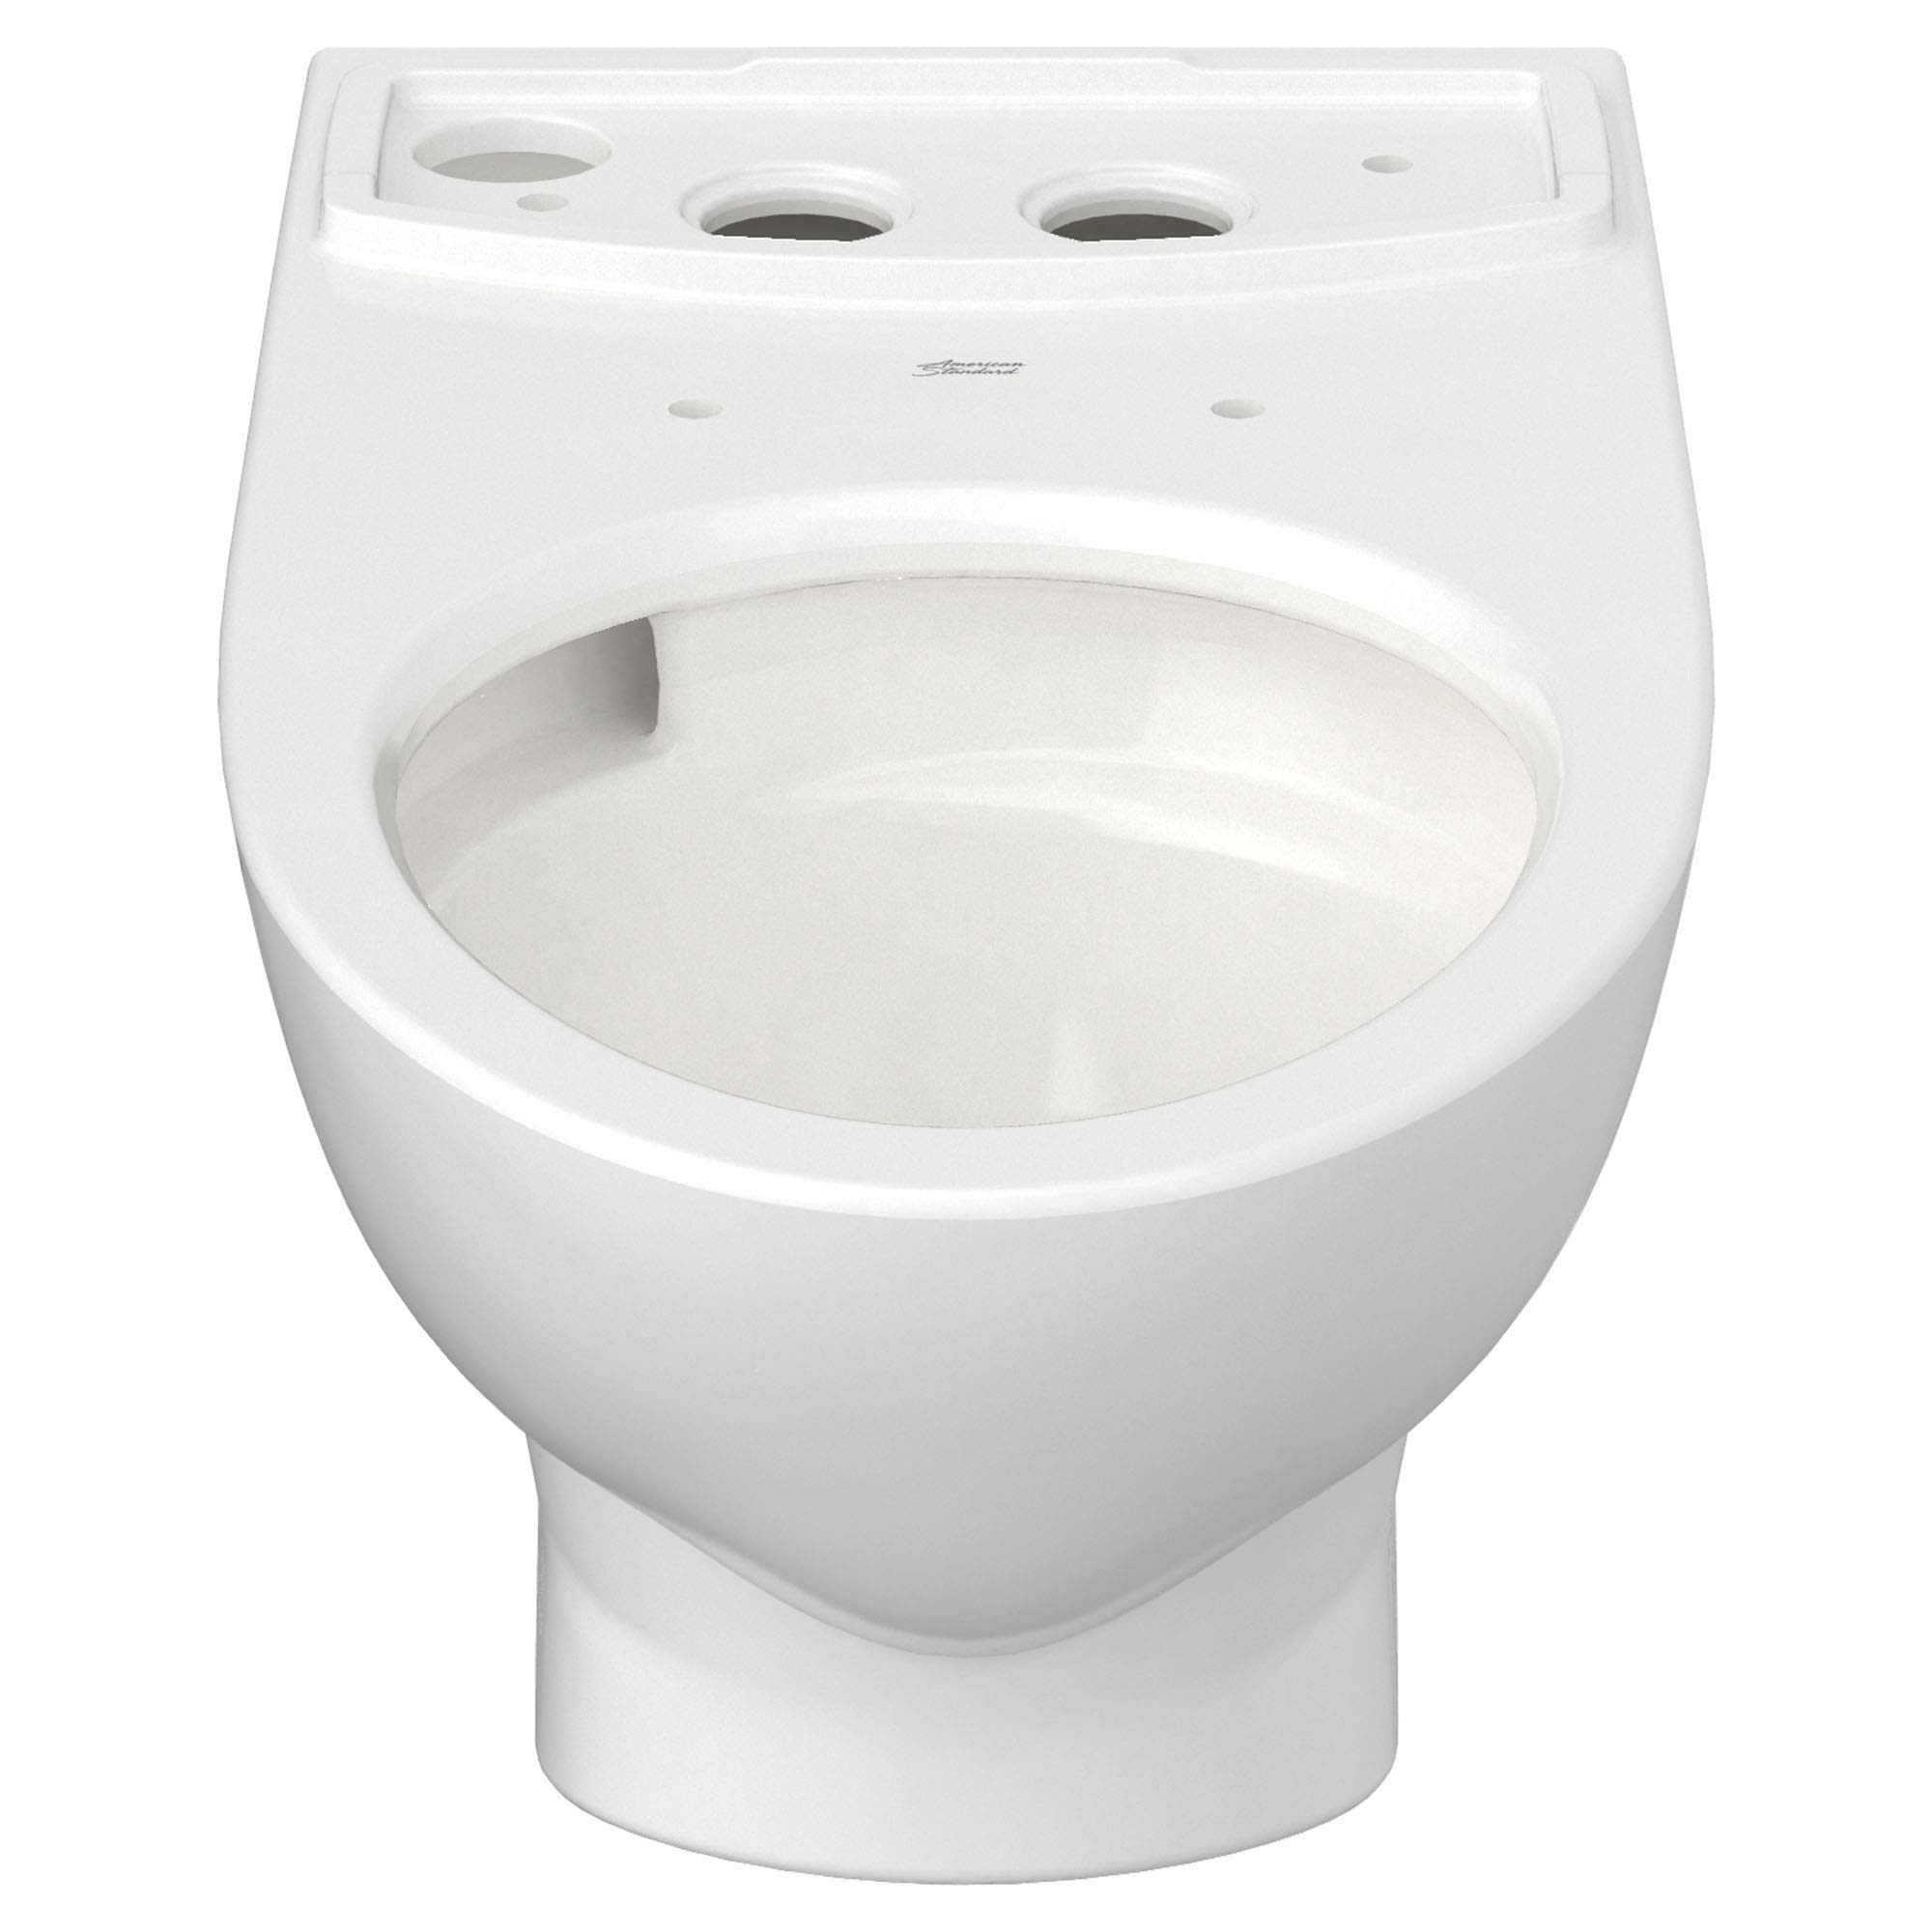 American Standard 3447101.020 Glenwall VorMax Elongated Wall-Hung Toilet Bowl White